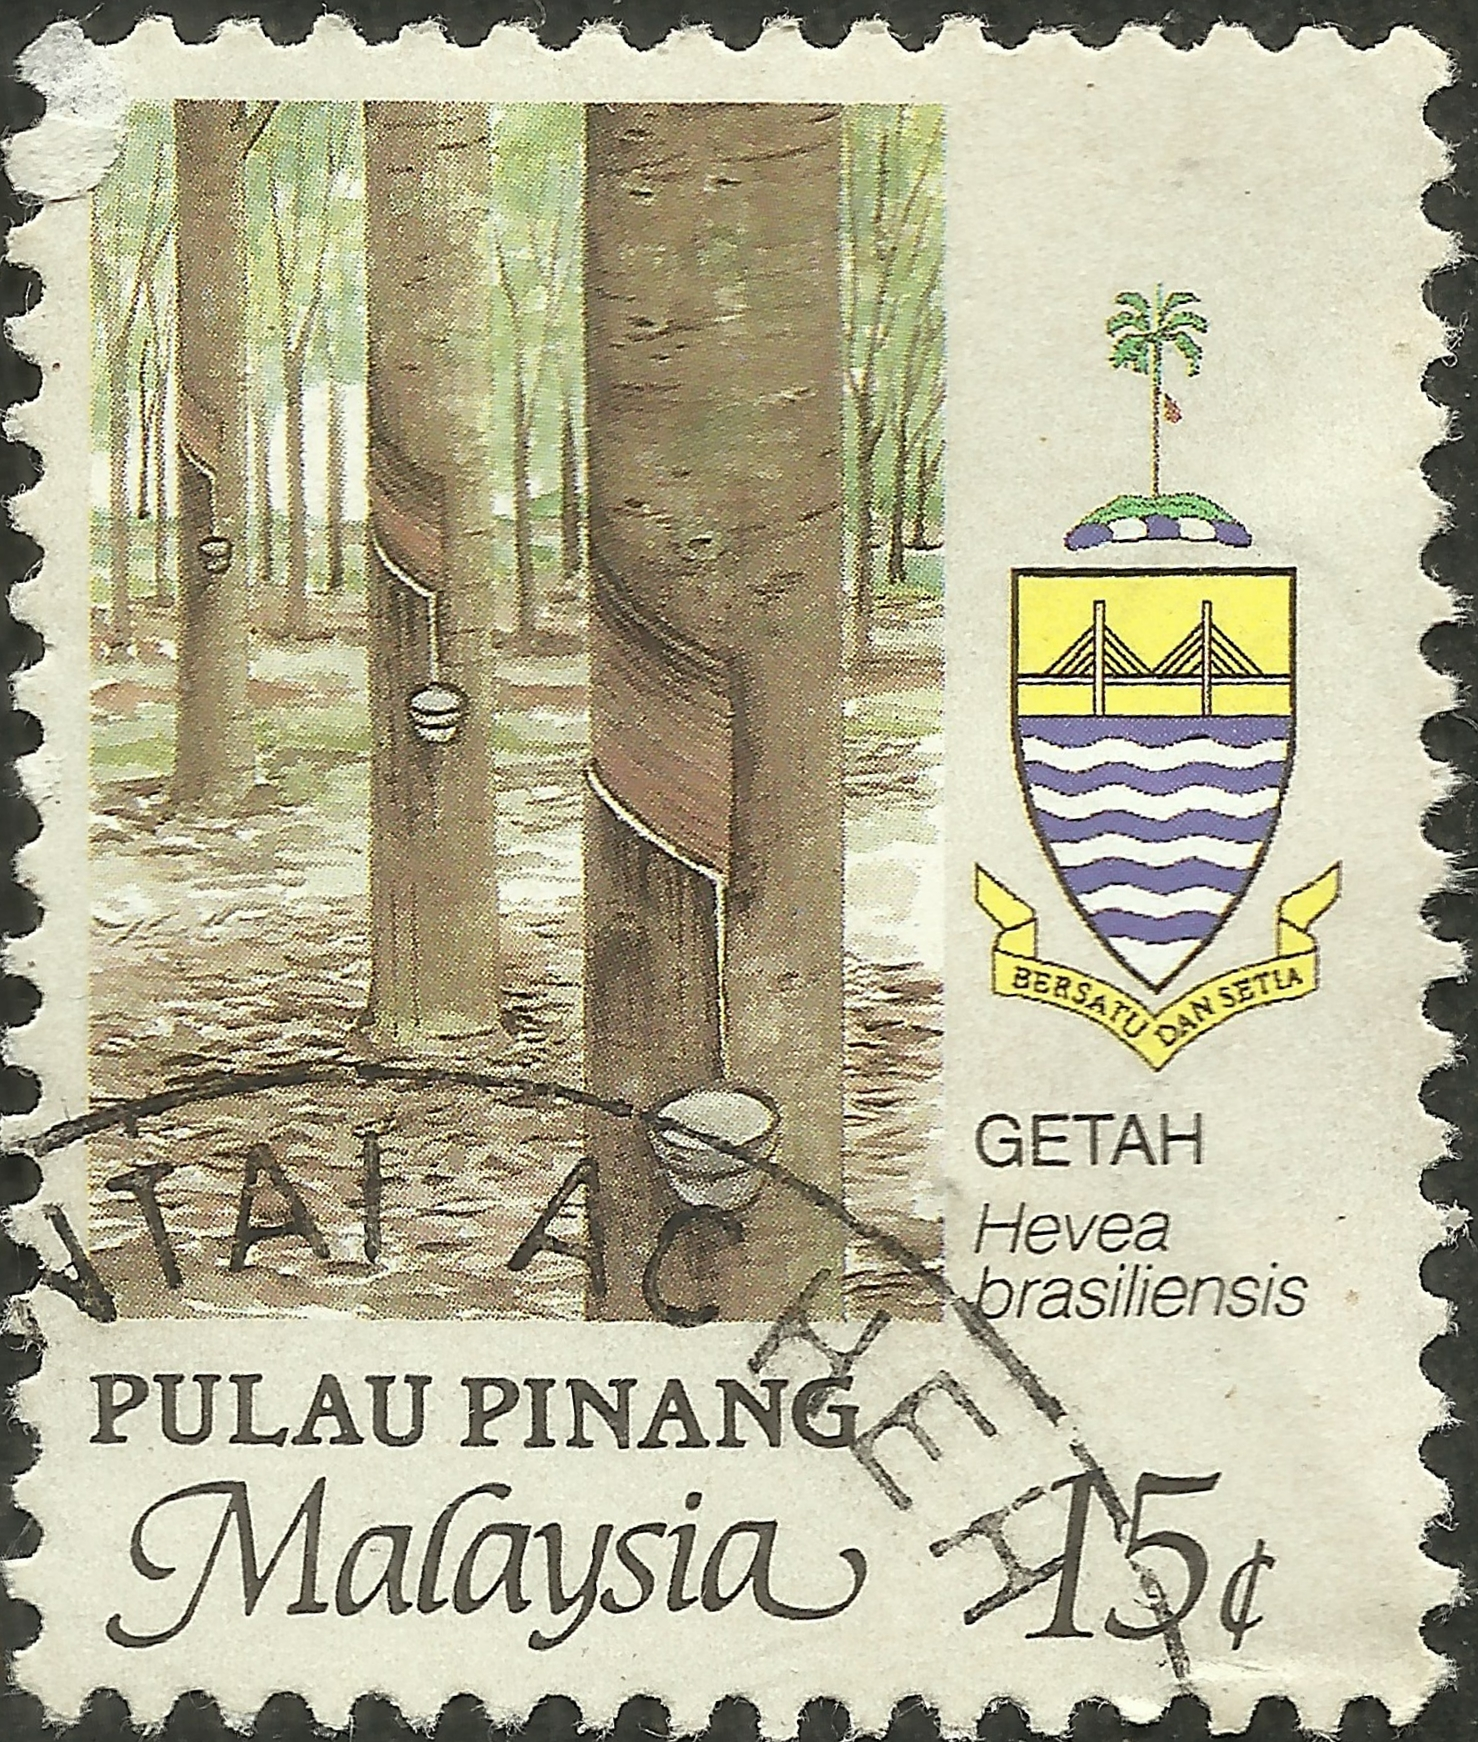 Penang [State of Malaysia] #92 (1986)